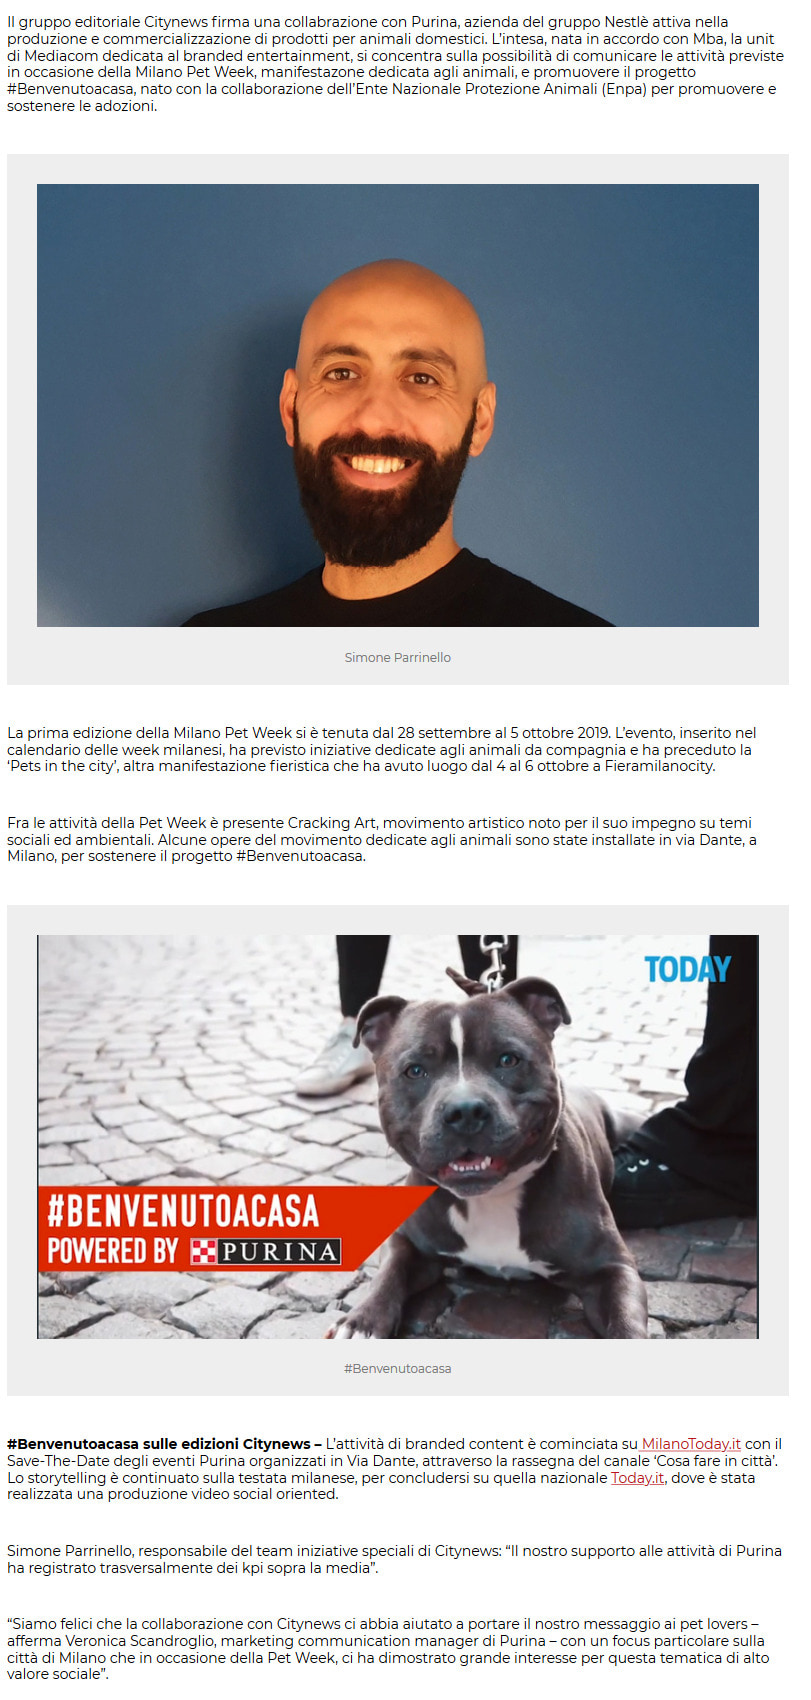 Citynews e Purina insieme per la Milano Pet Week - PrimaOnline, 26 novembre 2019-2